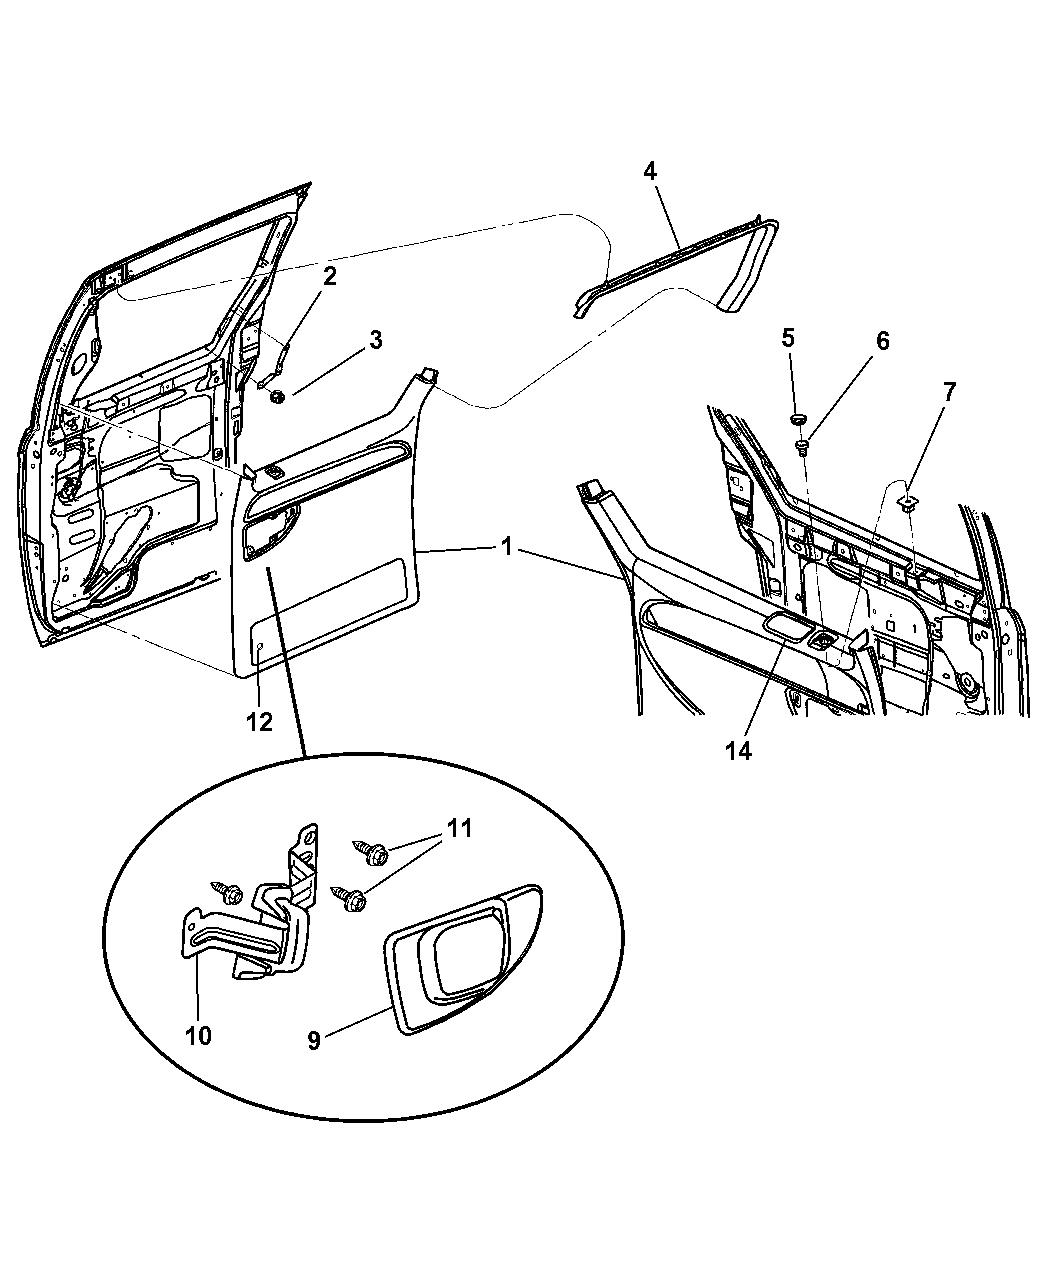 How To Remove Sliding Door Panel On Dodge Caravan: 2003 Dodge Caravan Door Panel